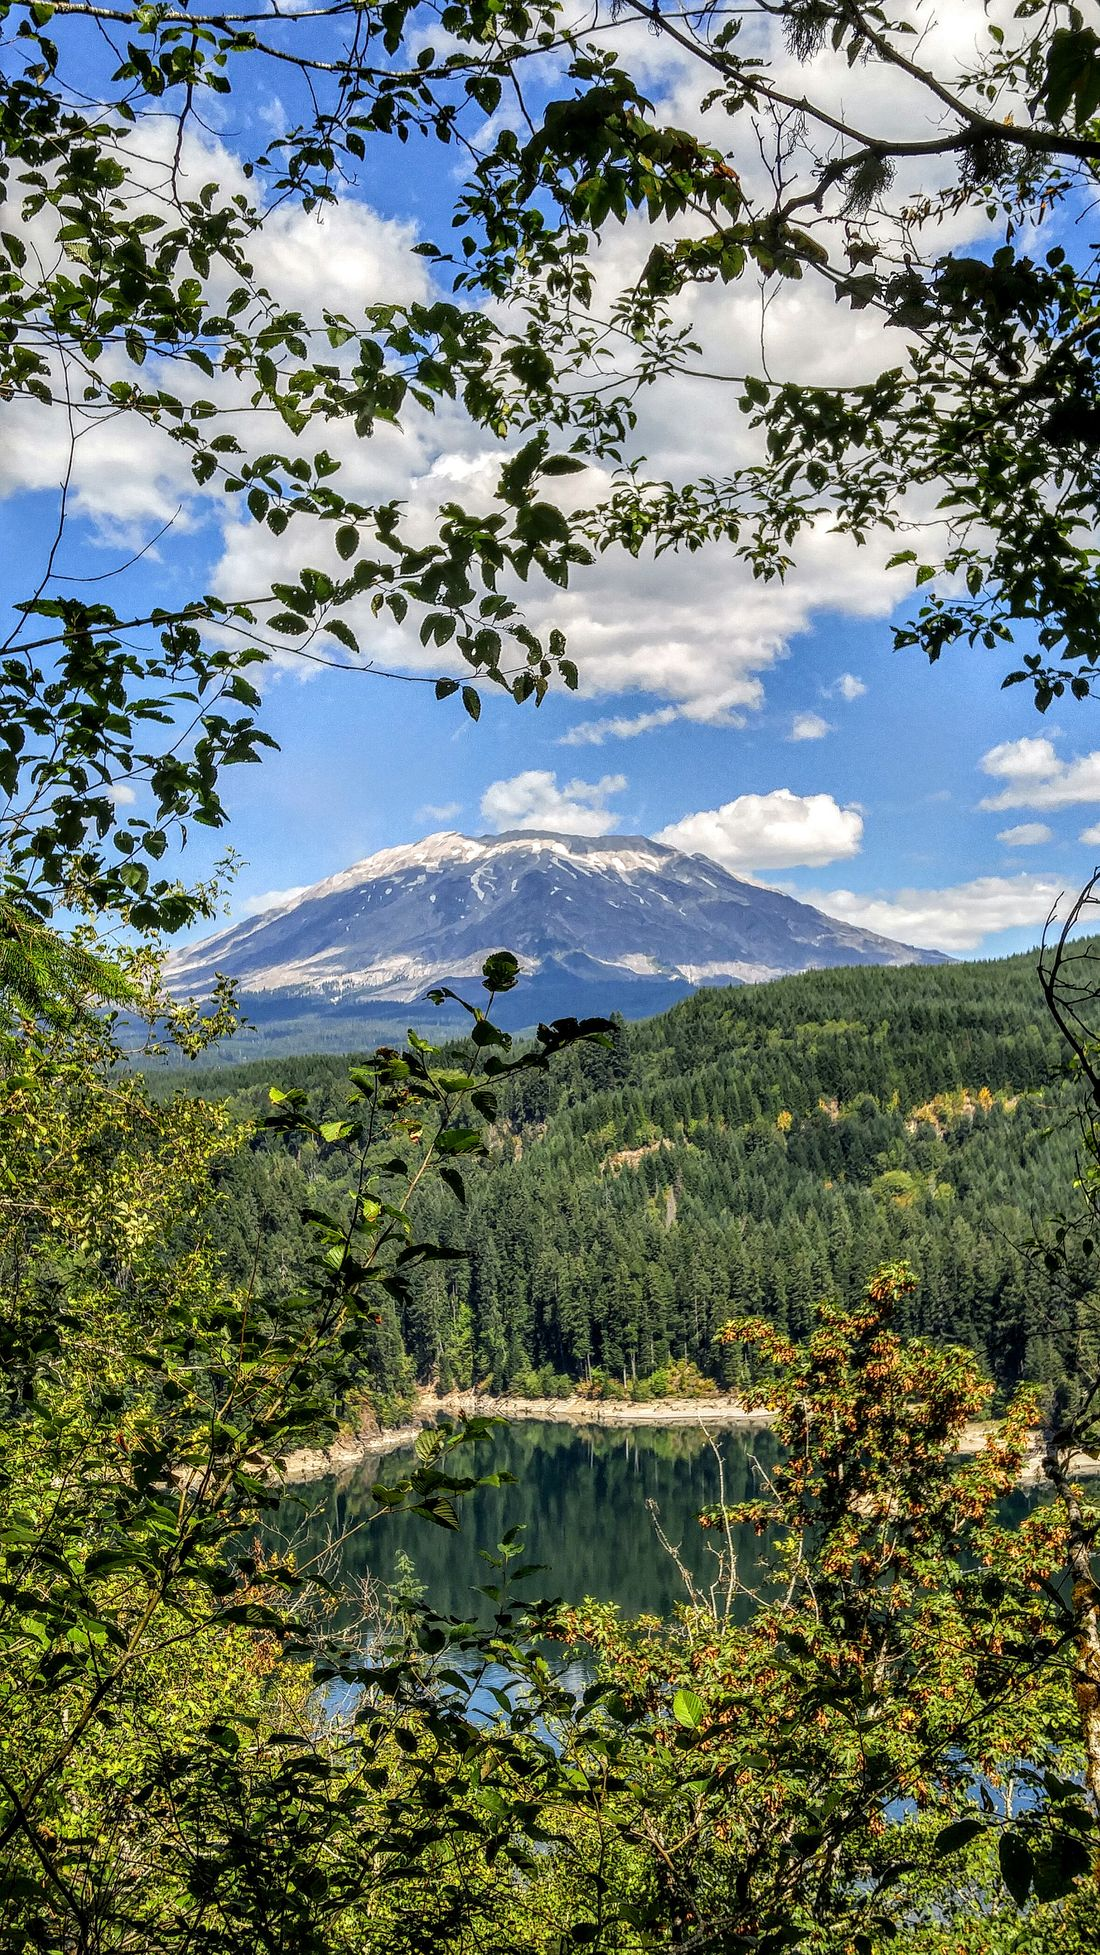 Mount St. Helens Mount St Helens Valcano Volcano Washington State Mountains Mountainscape Nature Nature Photography